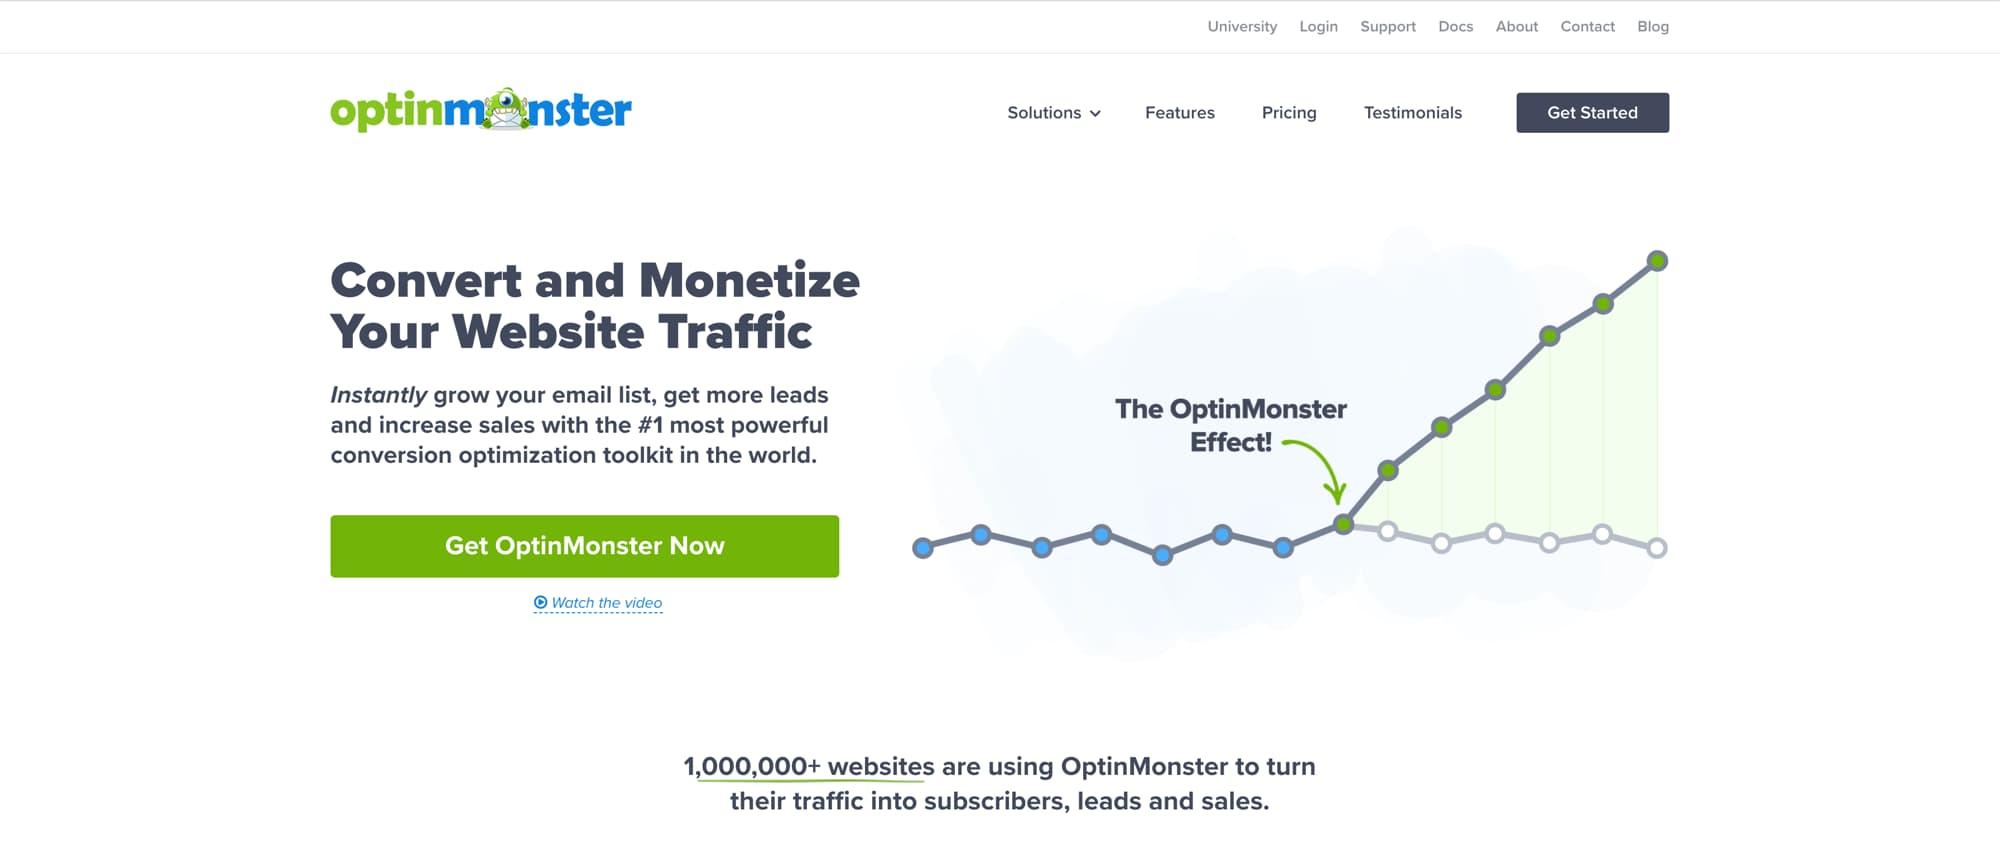 optinmonster alternative website